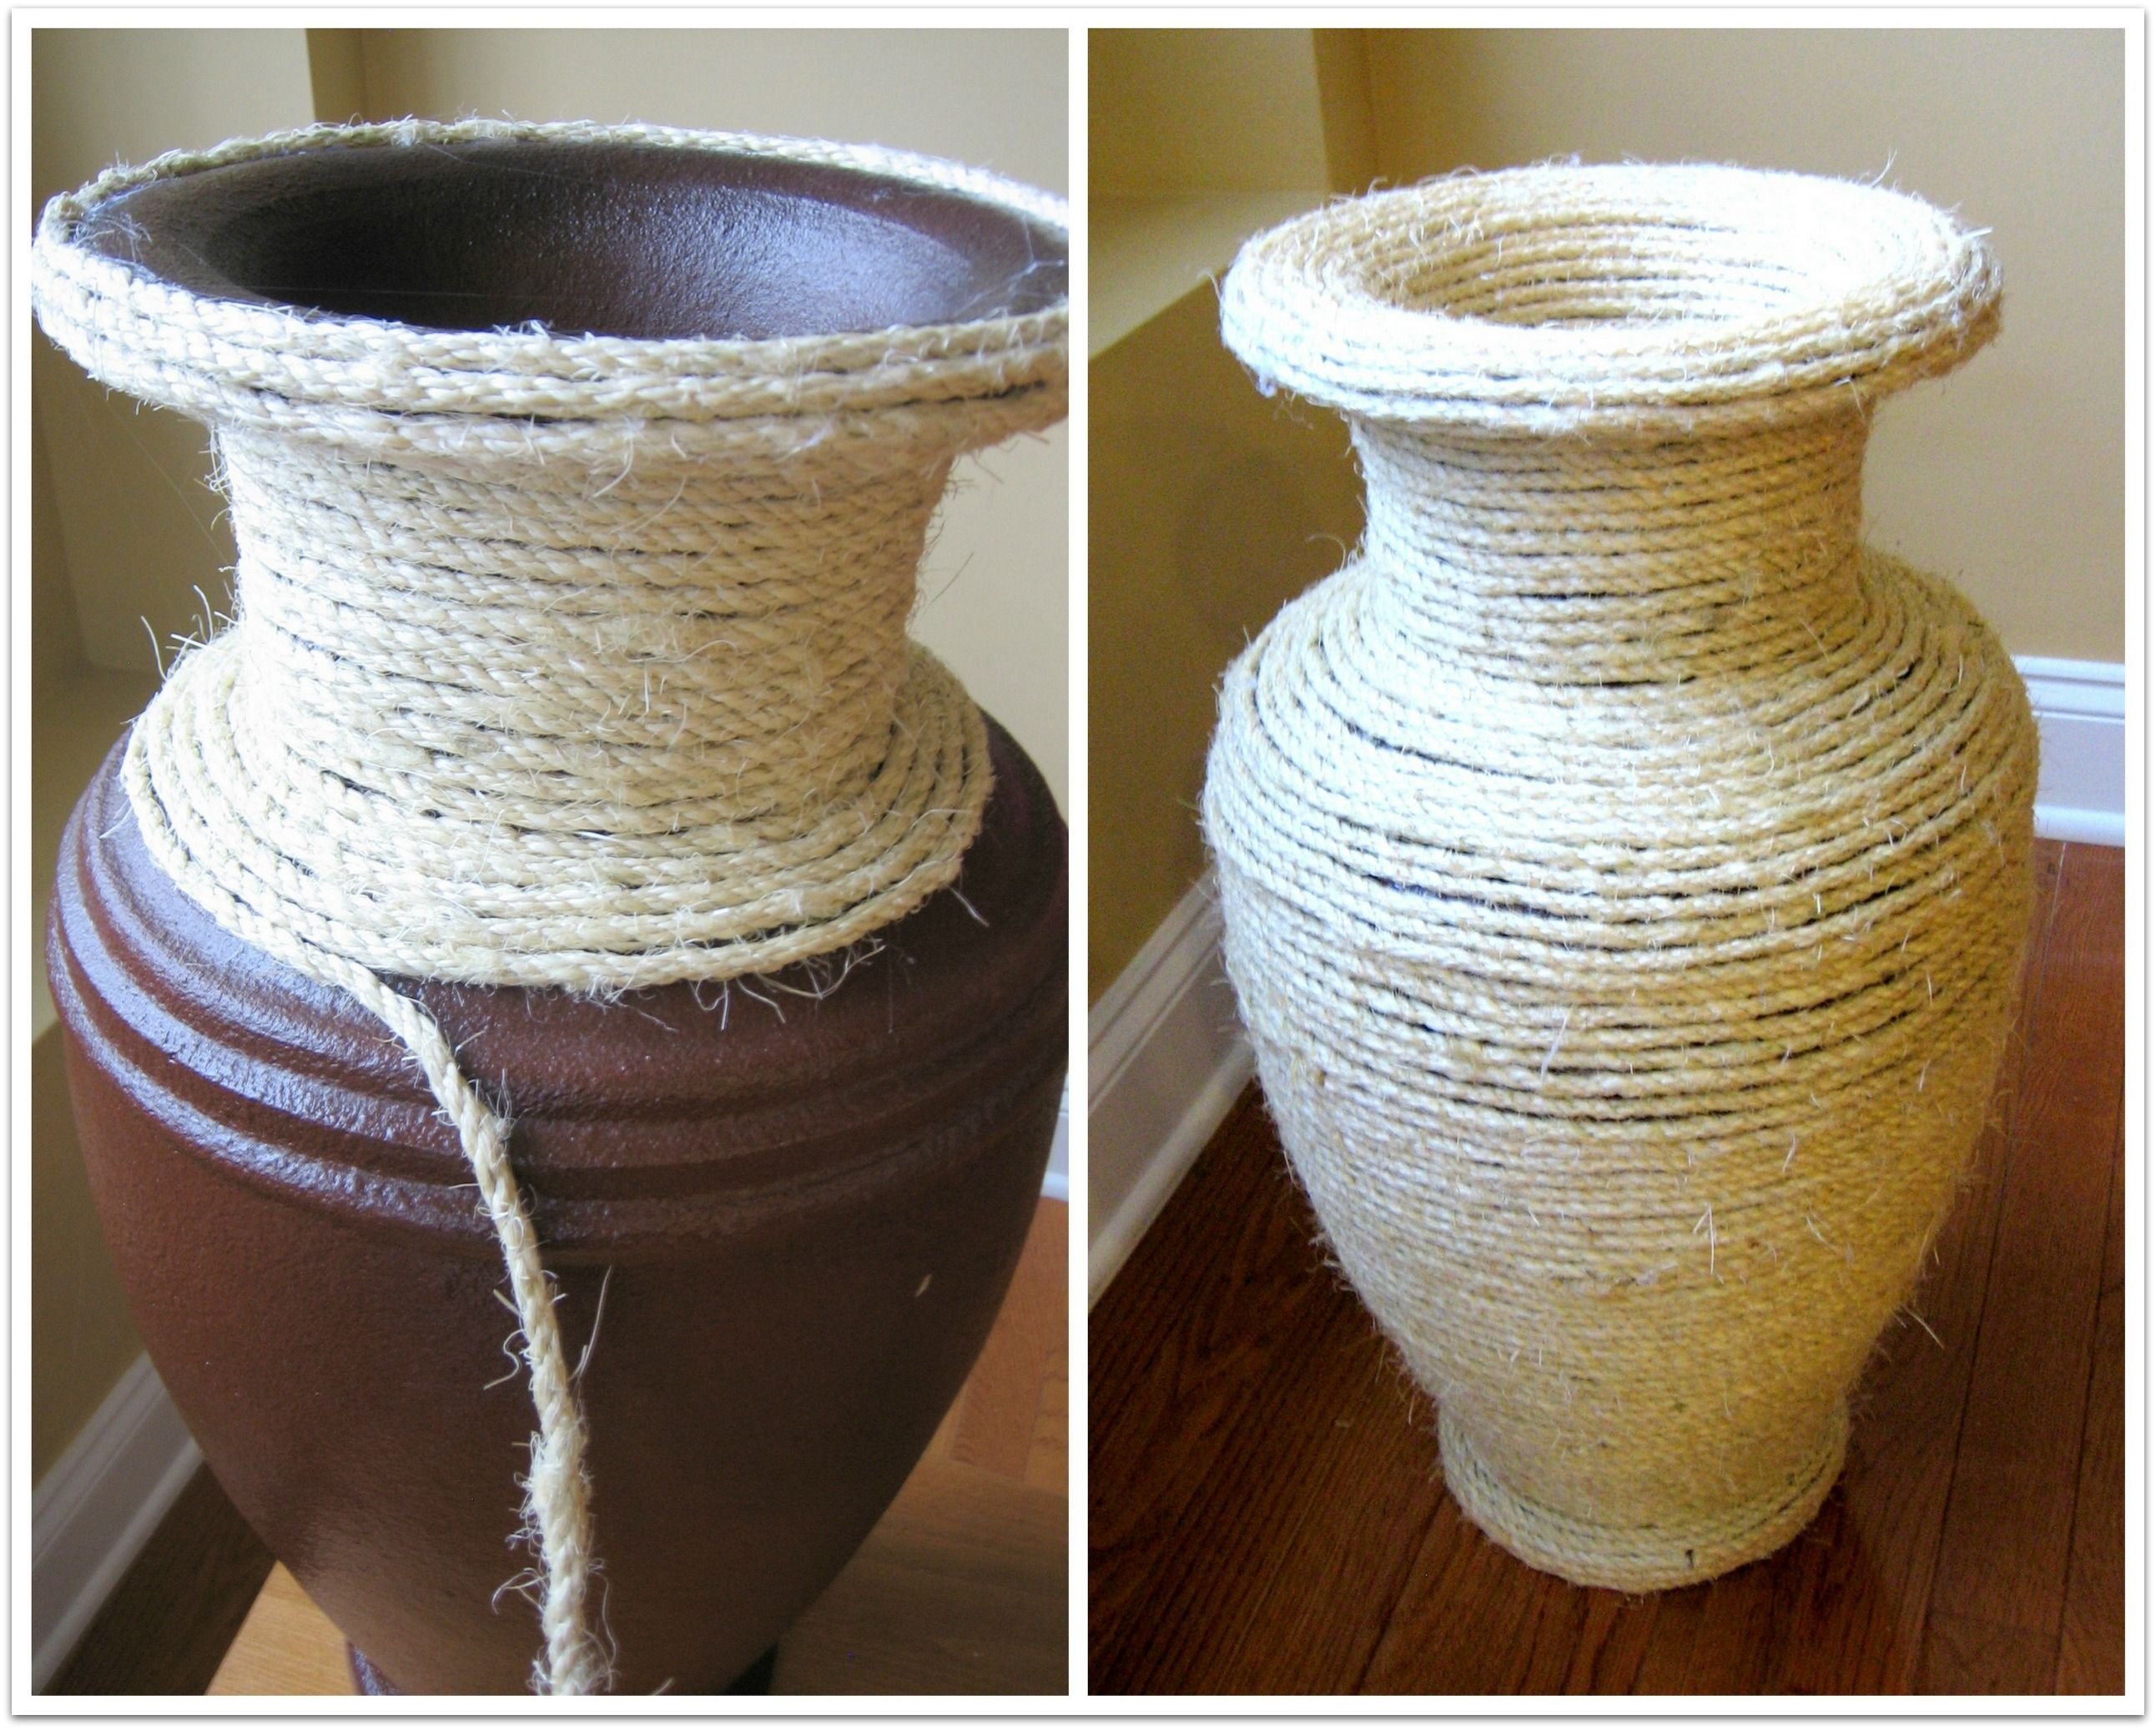 Sisal rope vase home decor crafts crafting with rope diy sisal rope vase home decor crafts crafting with rope diy handmade crafts reviewsmspy